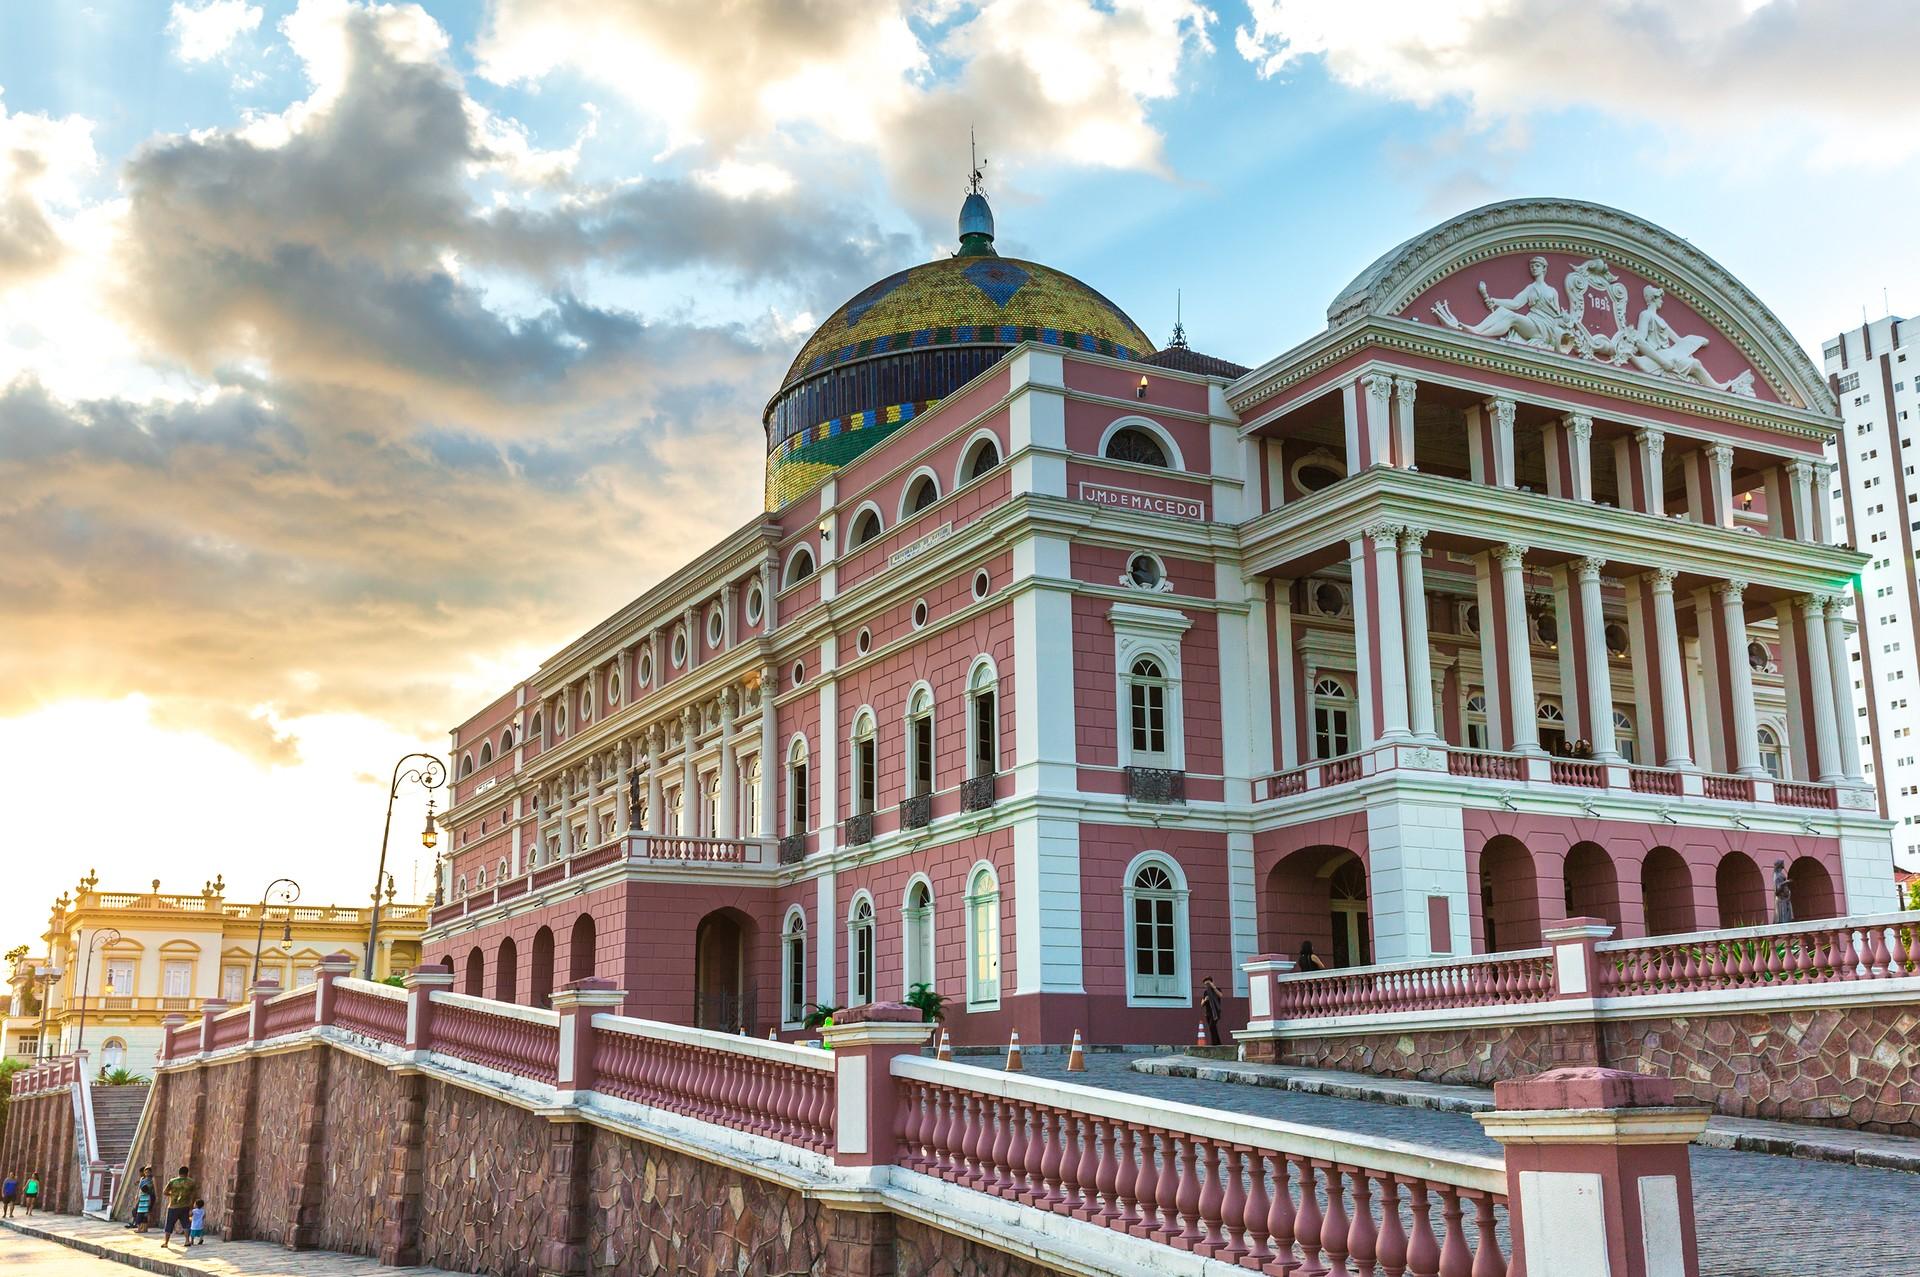 Opera House in Manaus Brazil